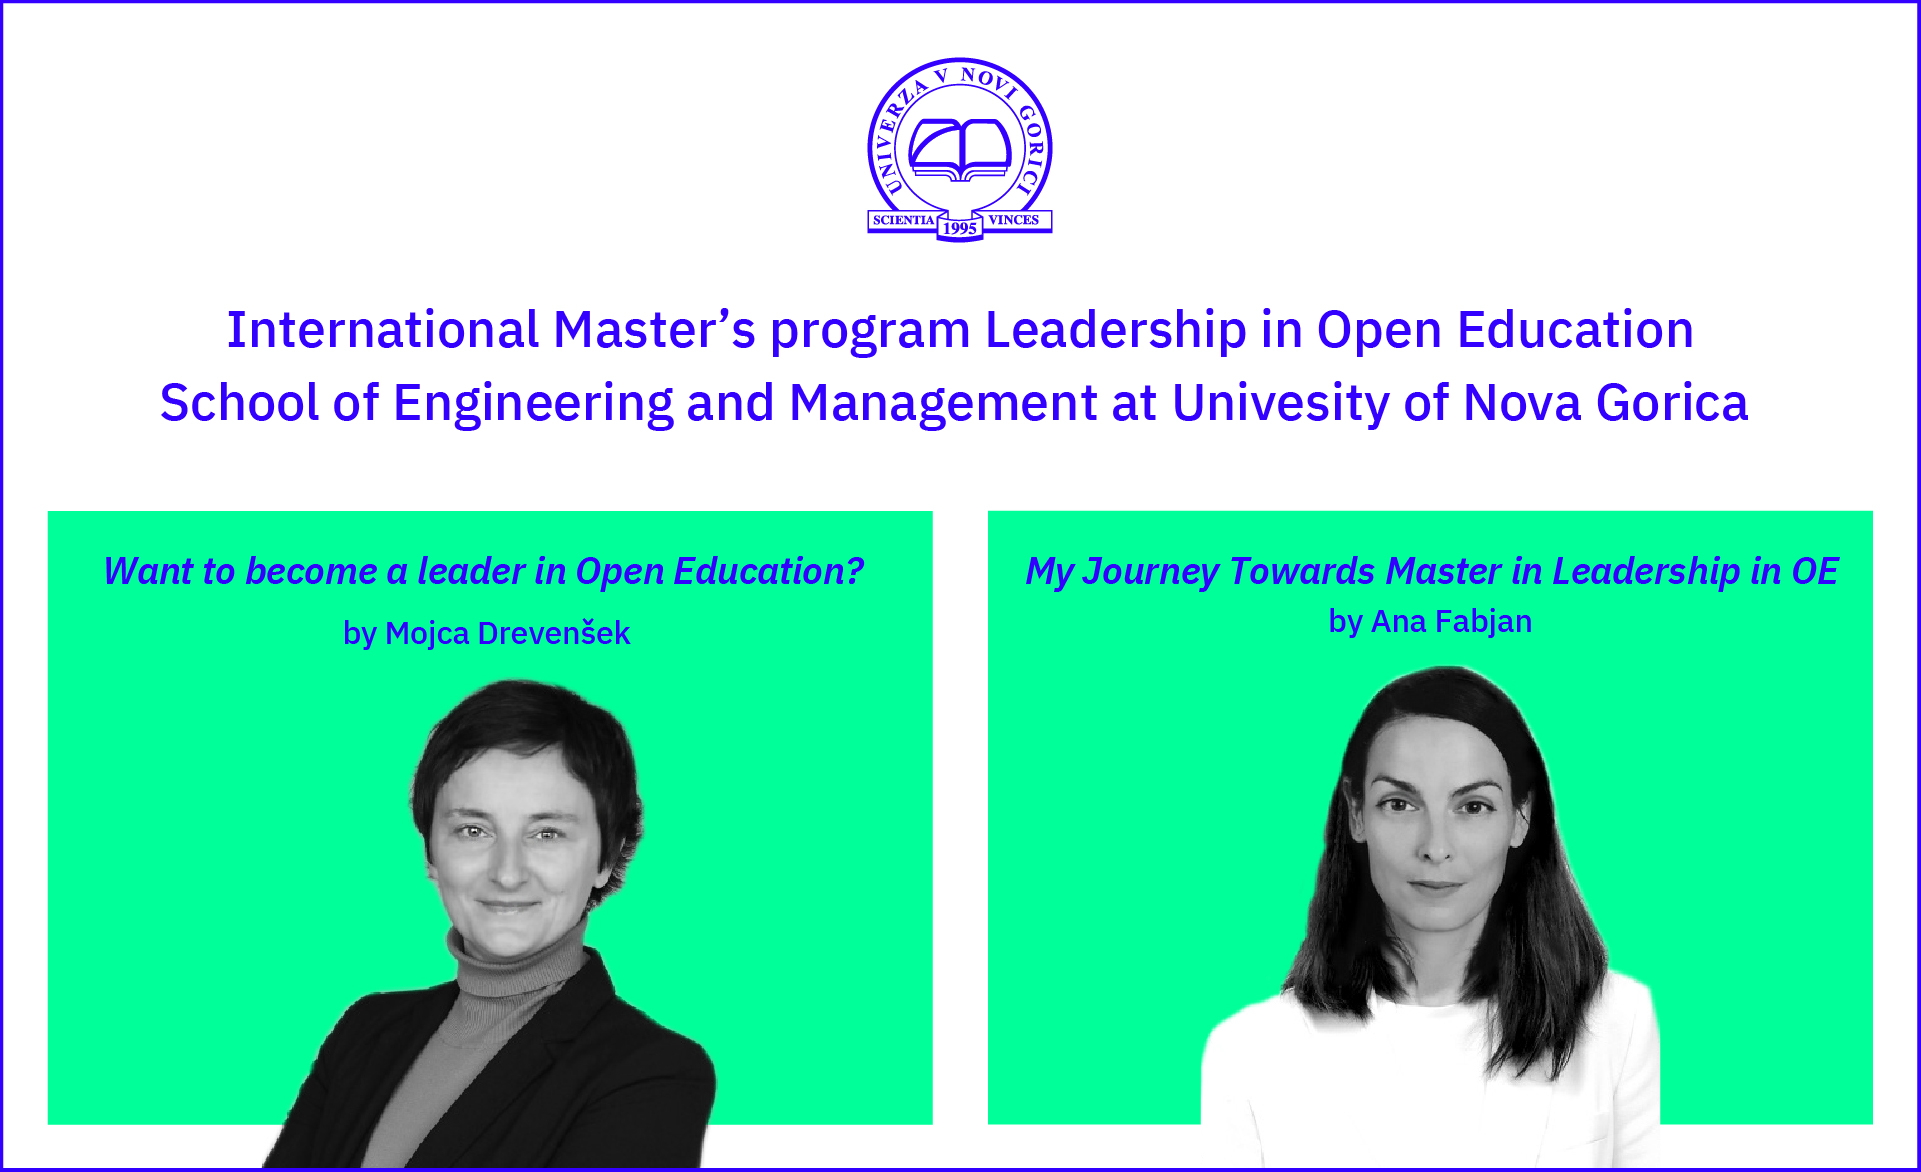 Master's program Leadership in Open Education